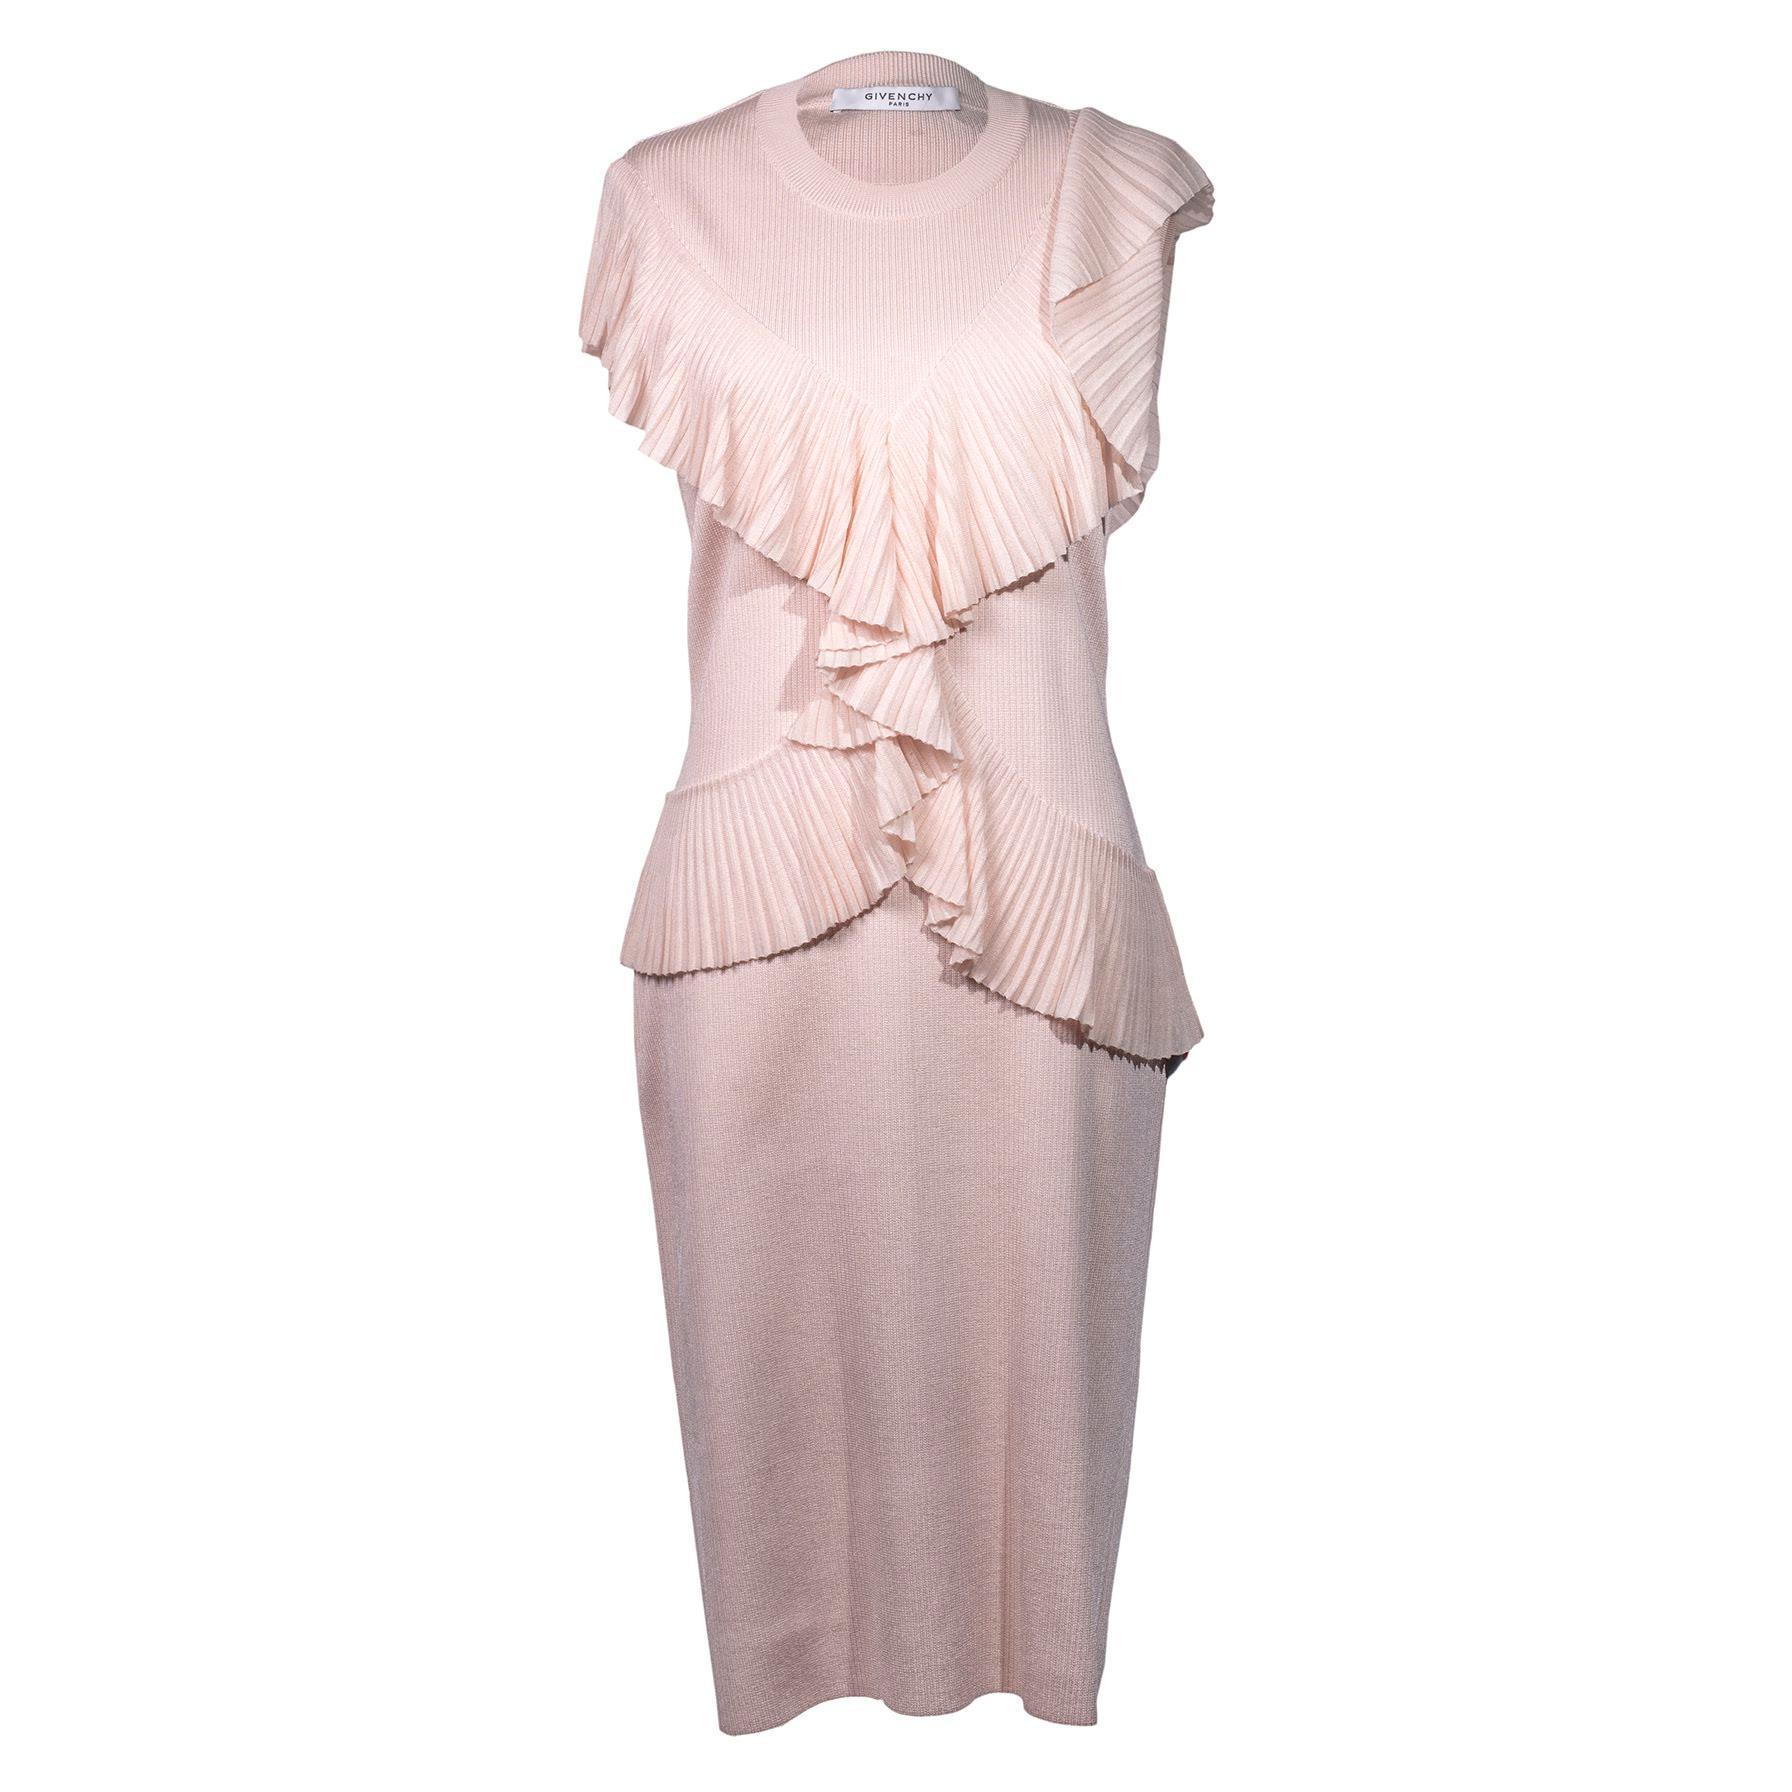 Givenchy Large Pink Ruffle Dress